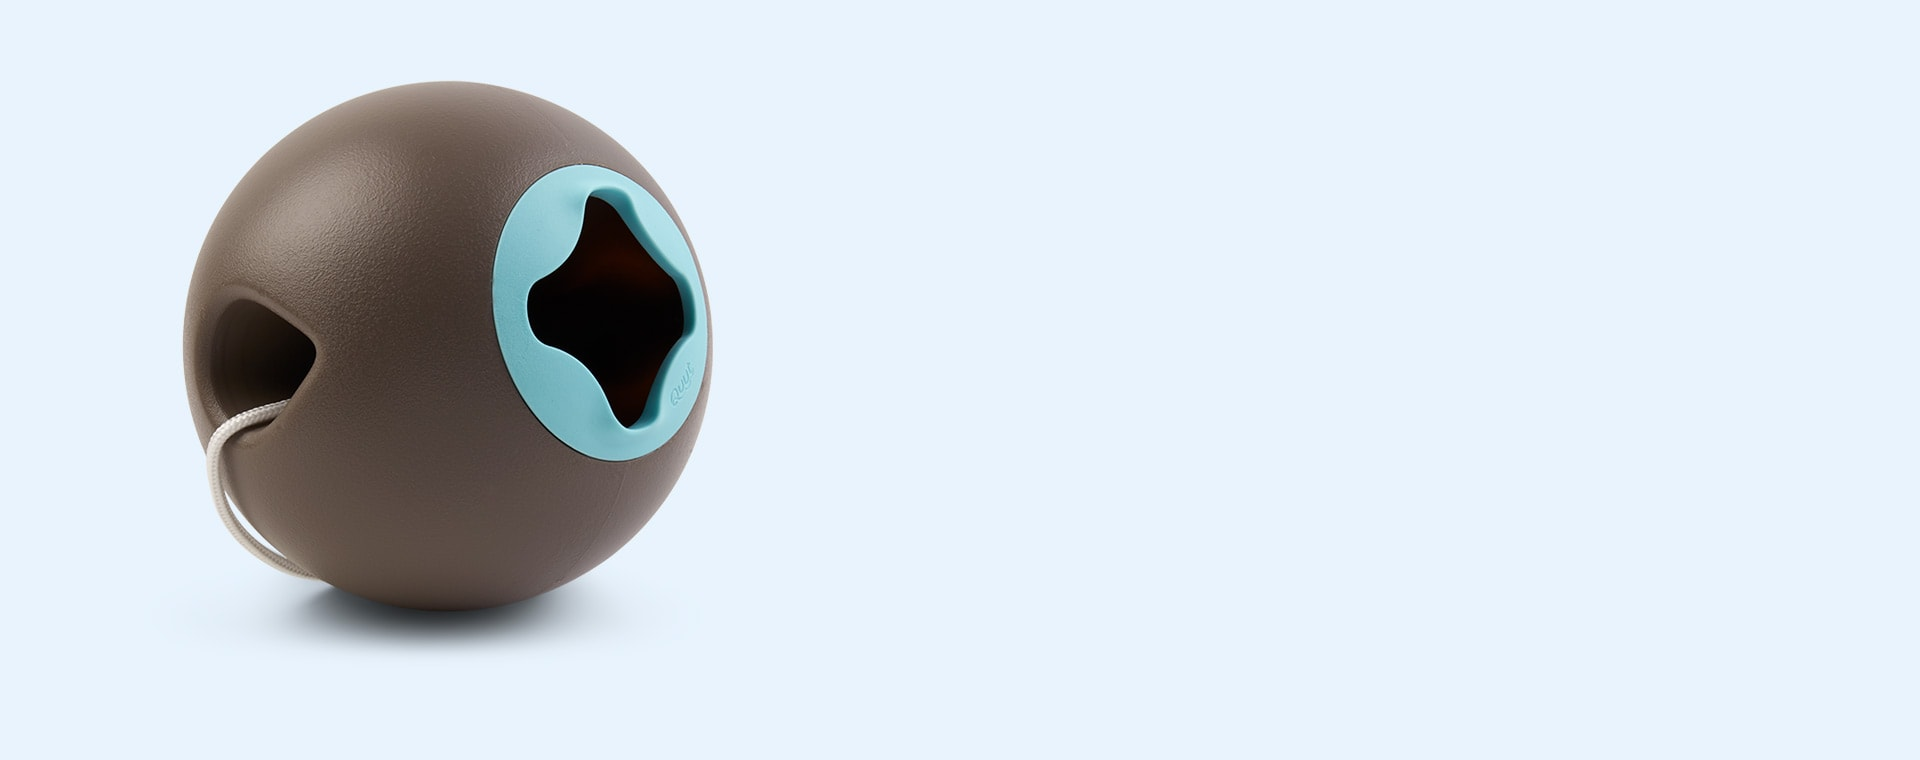 Bungee Grey Quut Ballo Bucket